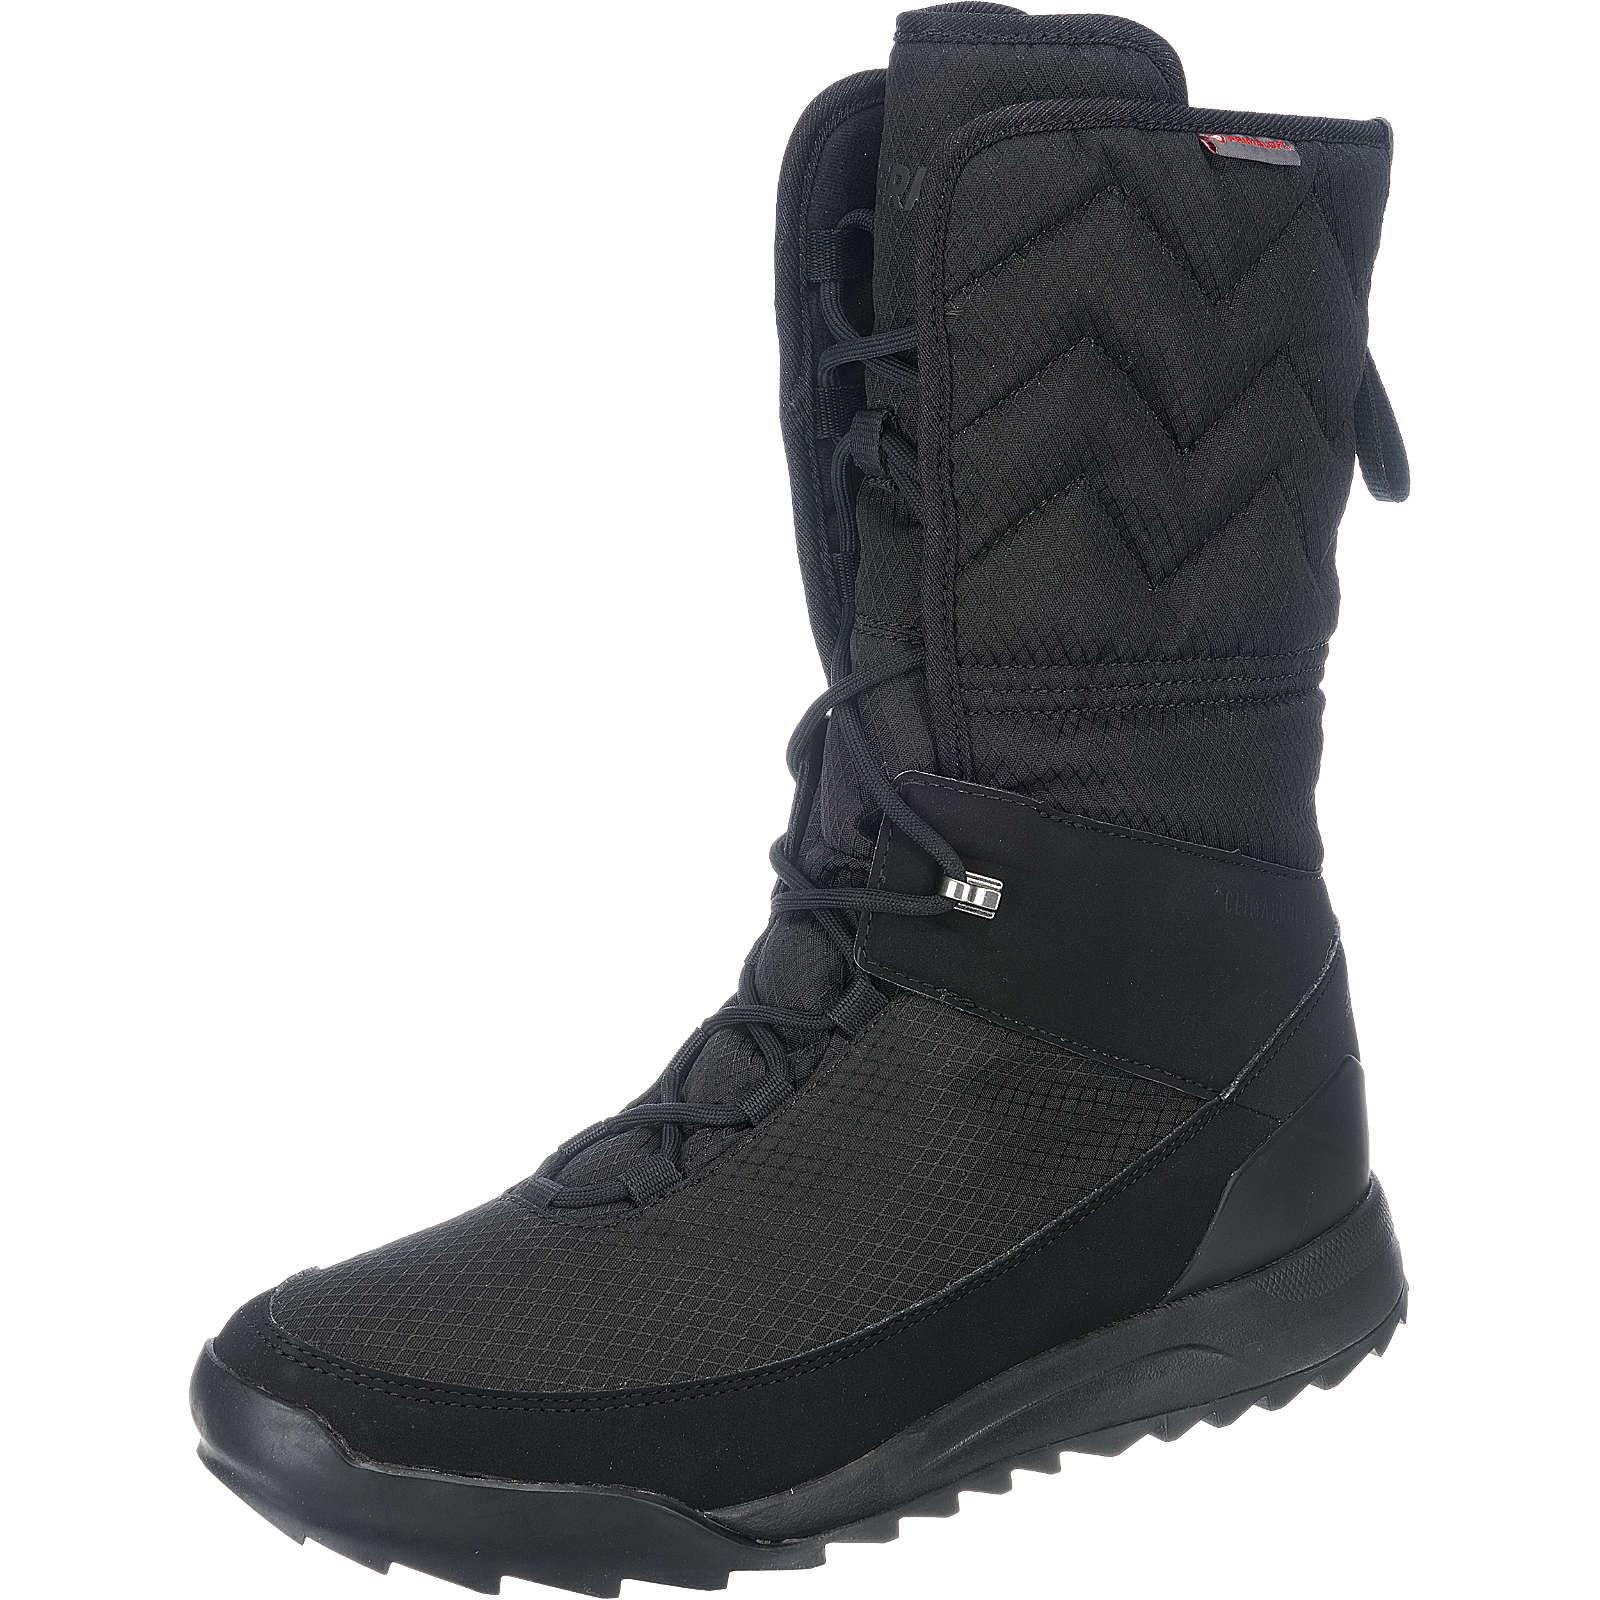 adidas Performance Terrex Choleah High Cp Stiefel schwarz Damen Gr. 38 2/3